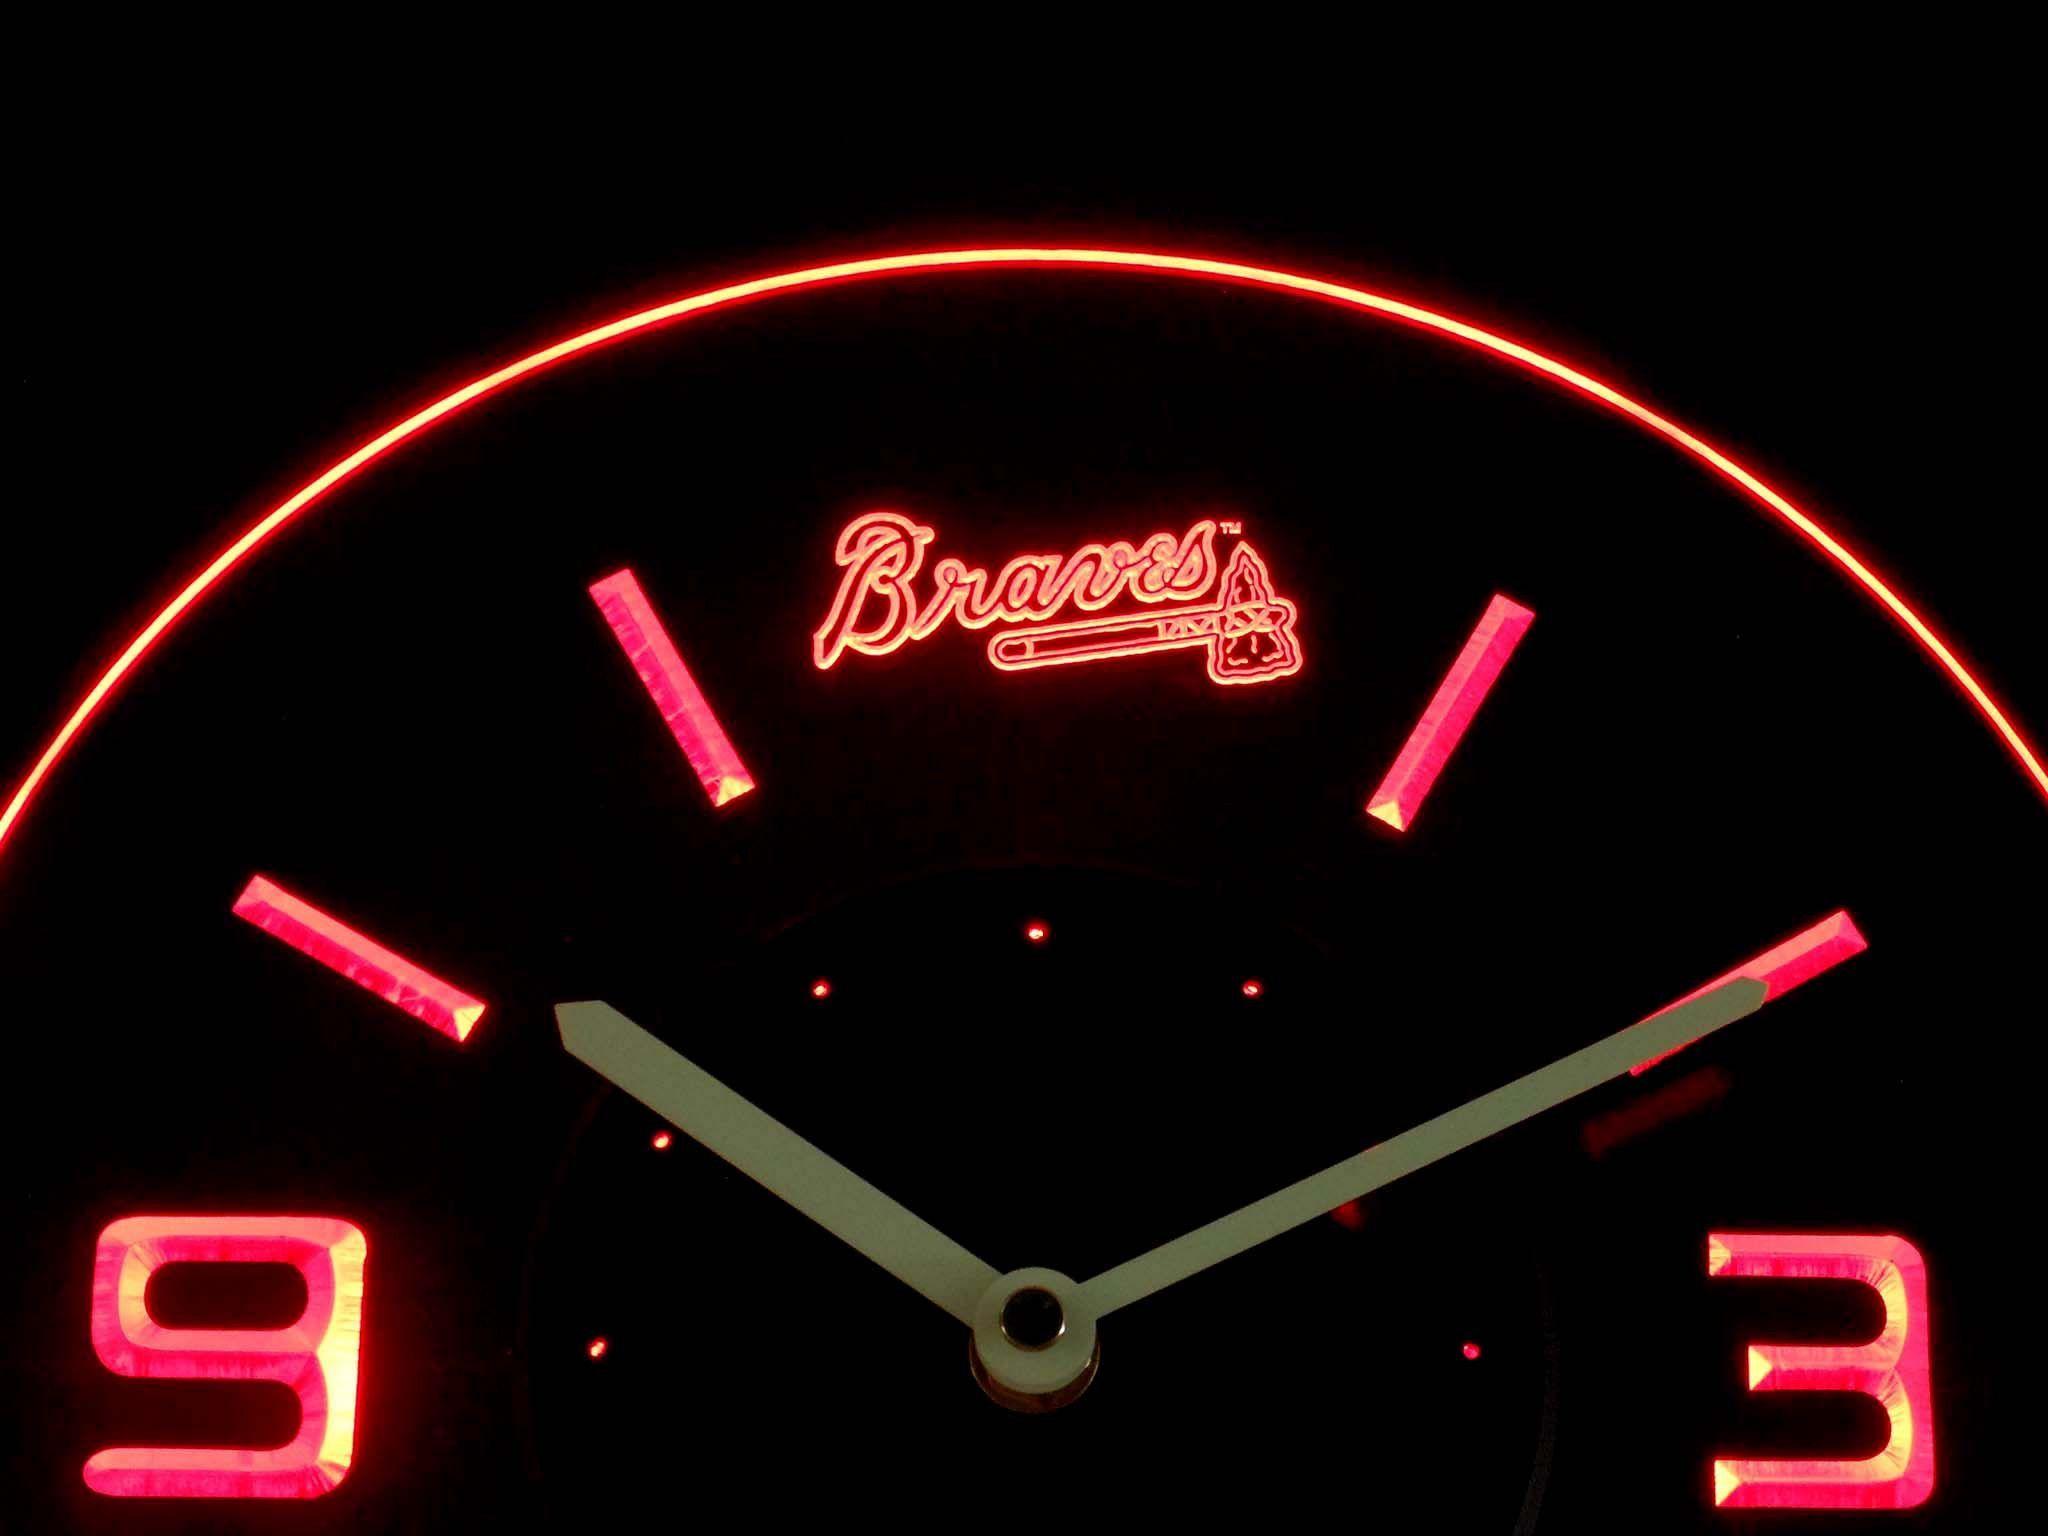 Atlanta Braves Modern Led Neon Wall Clock Neon Clock Wall Clock Led Wall Clock